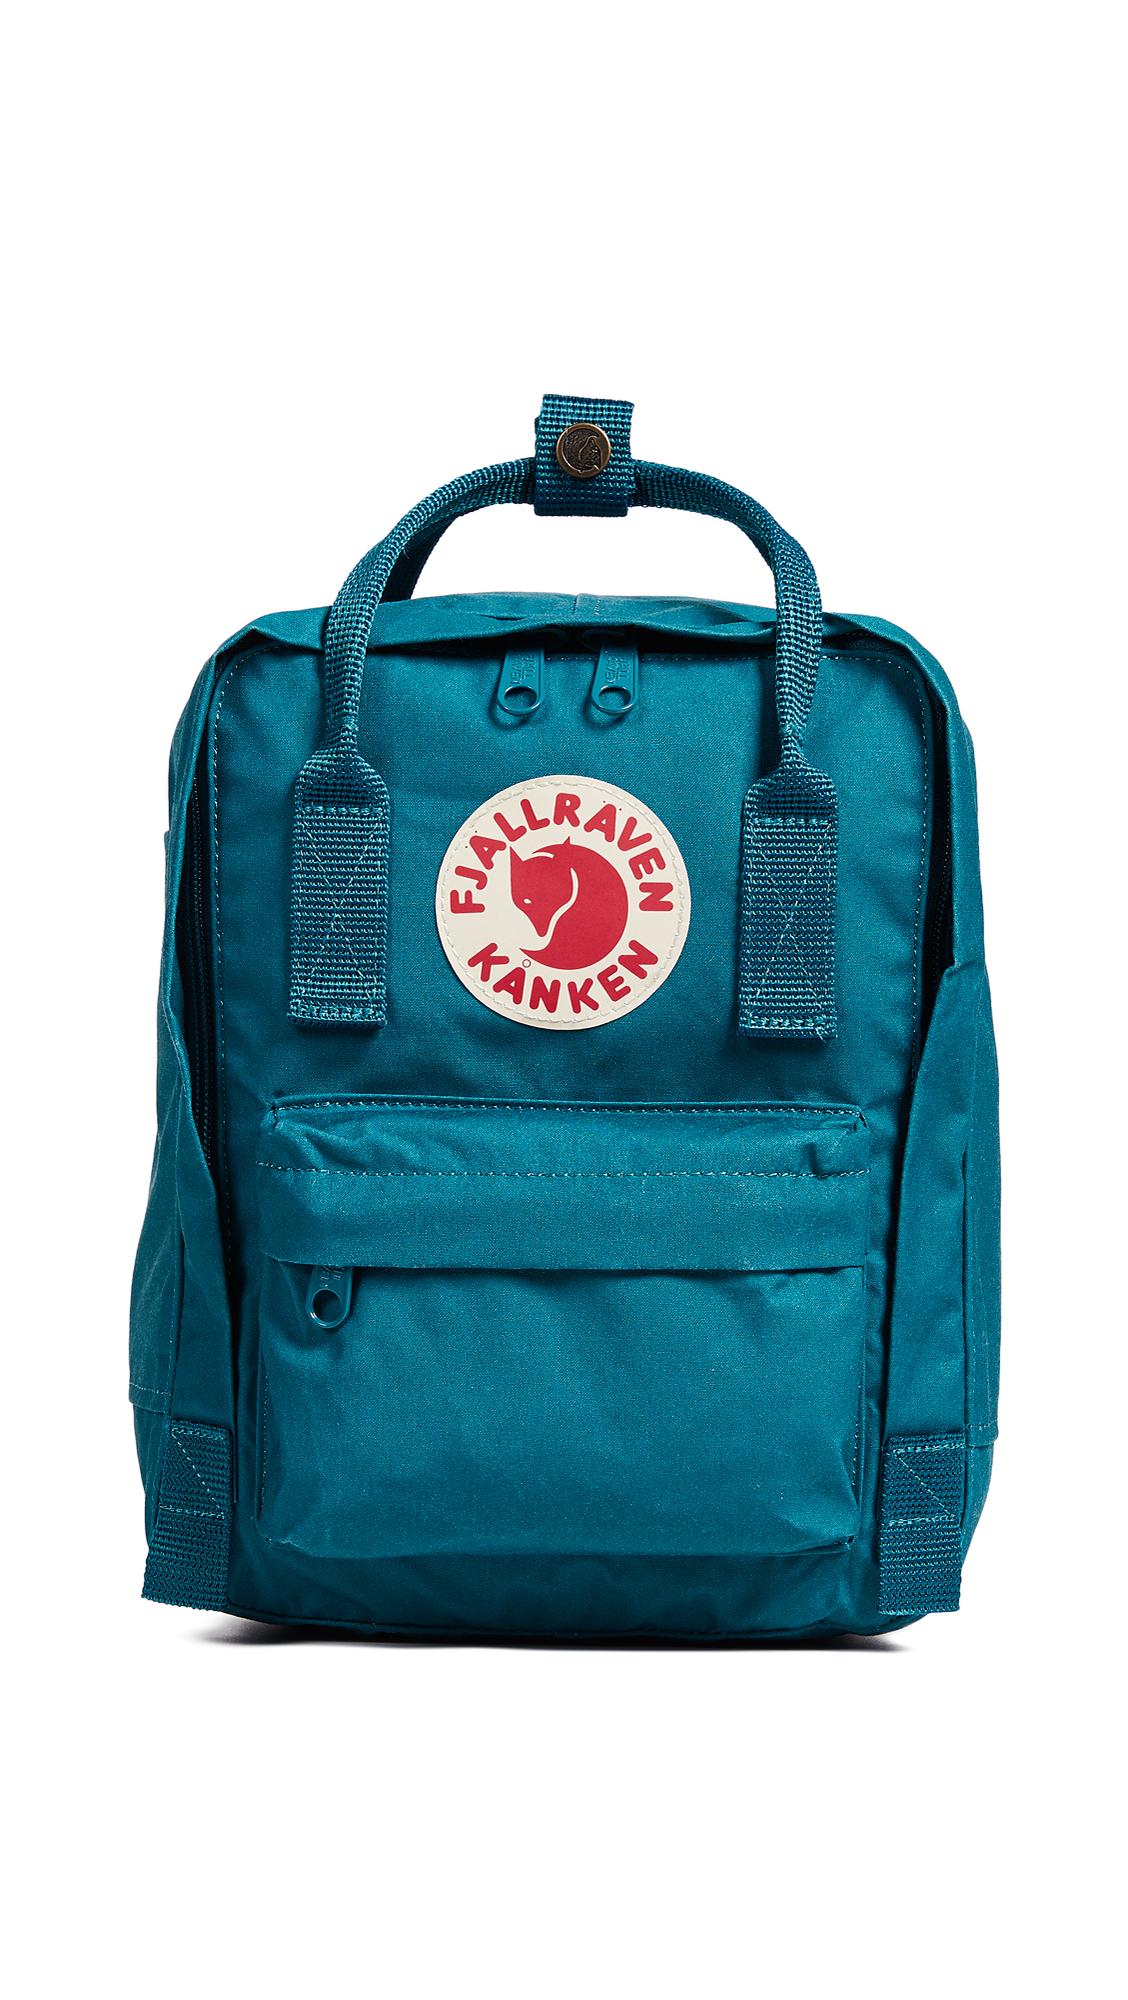 Fjallraven Kanken Mini Backpack Shopbop Classic Birch Green